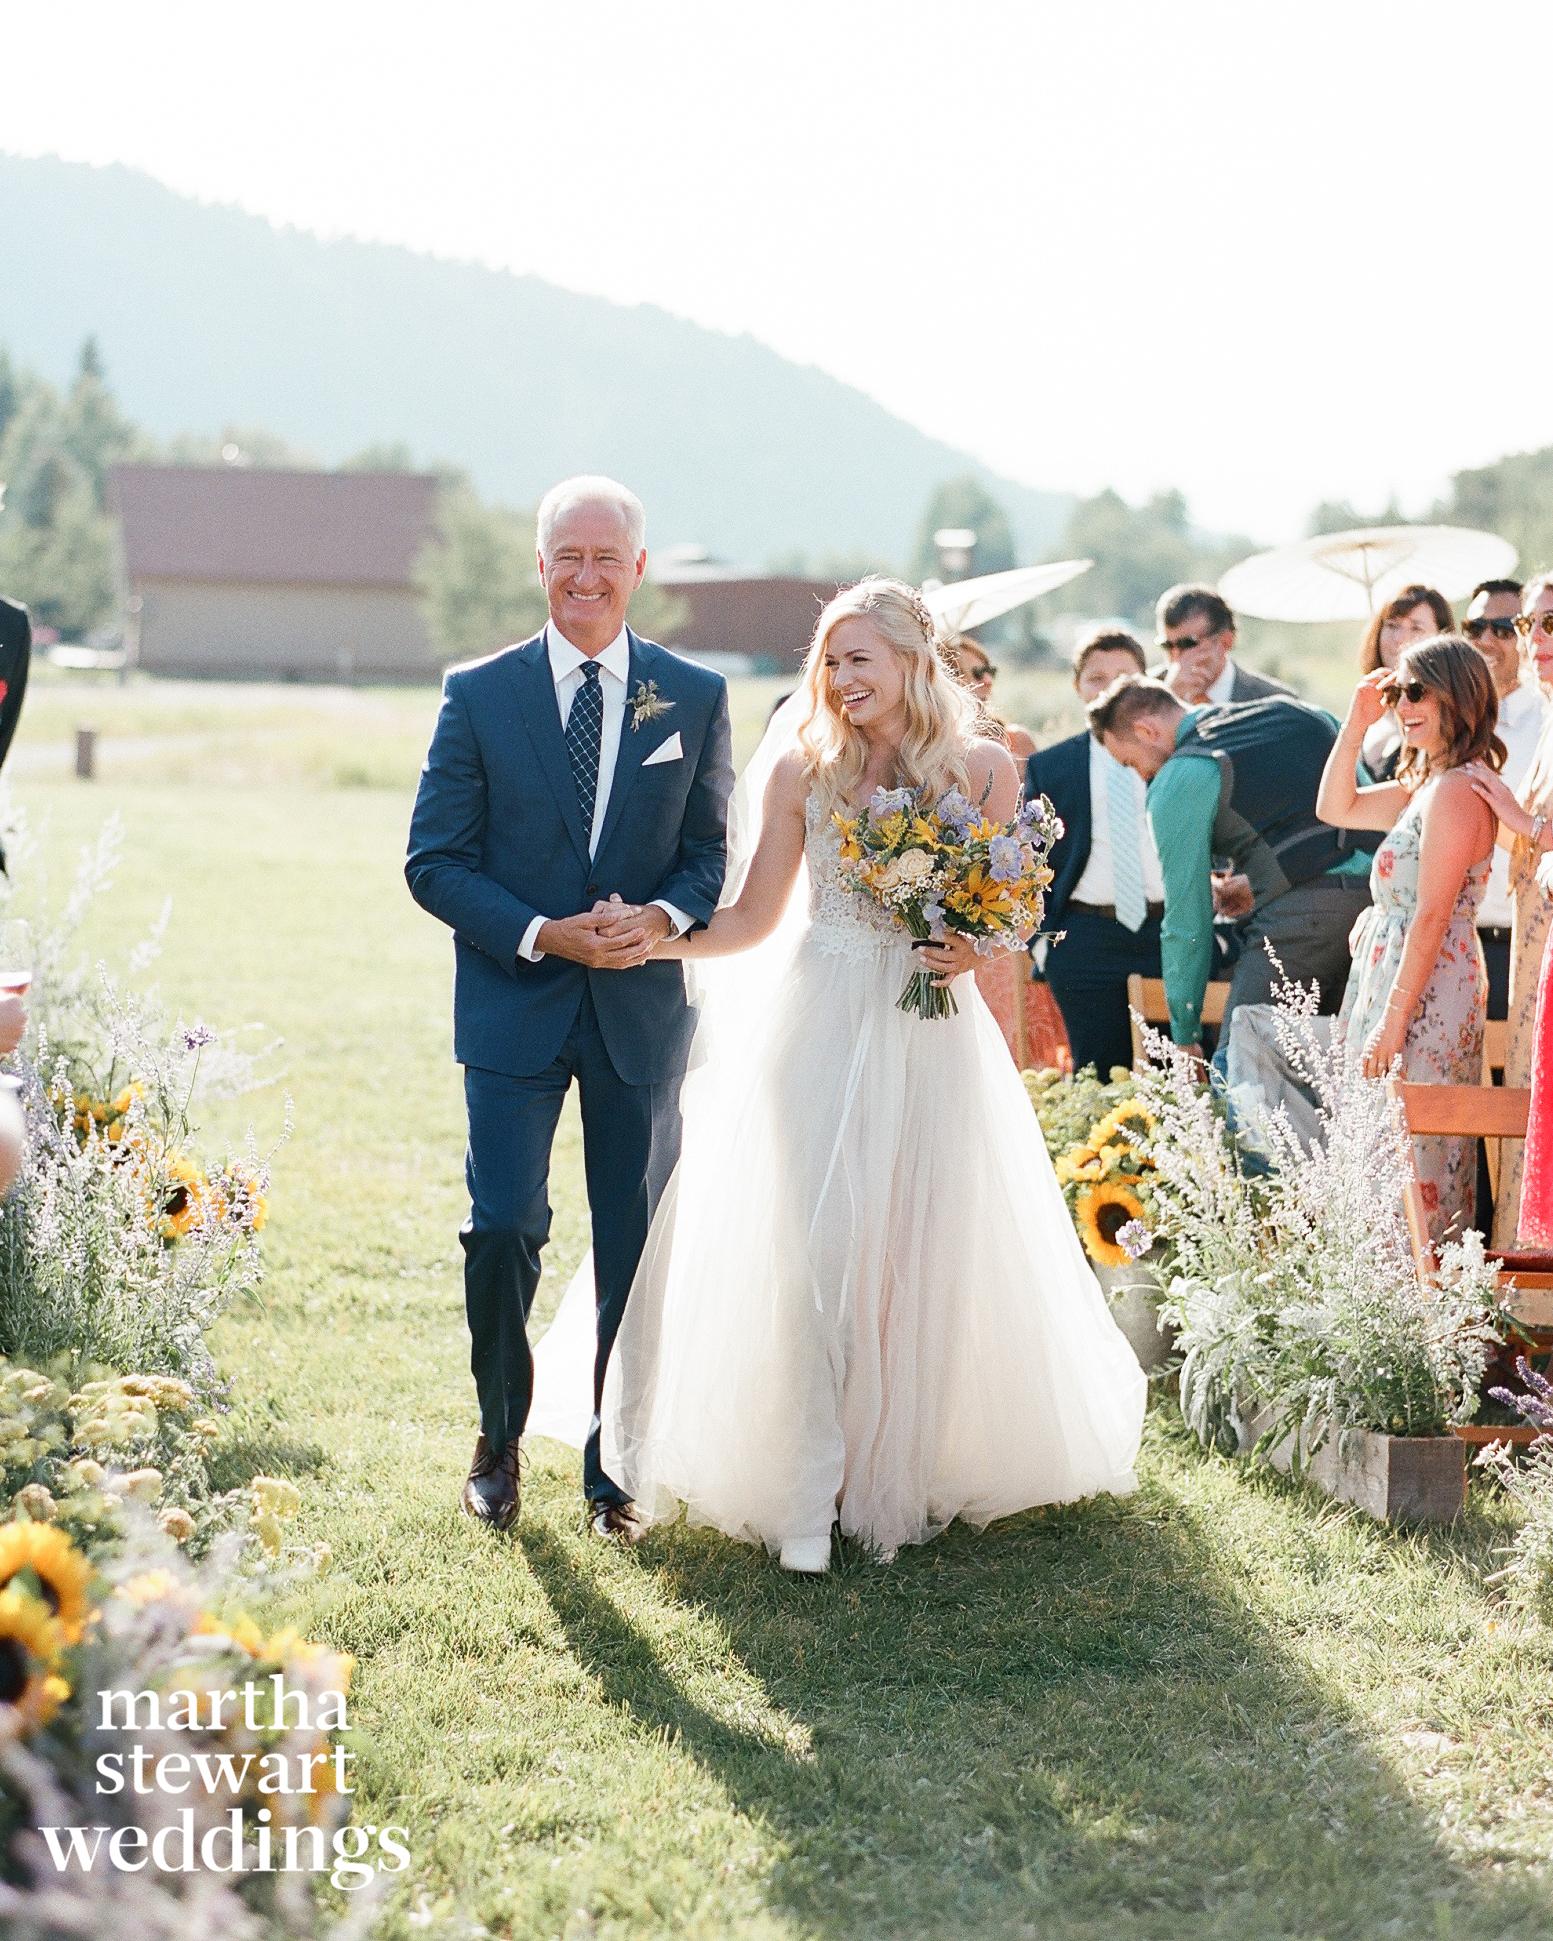 beth behrs michael gladis wedding processional sylvie gil